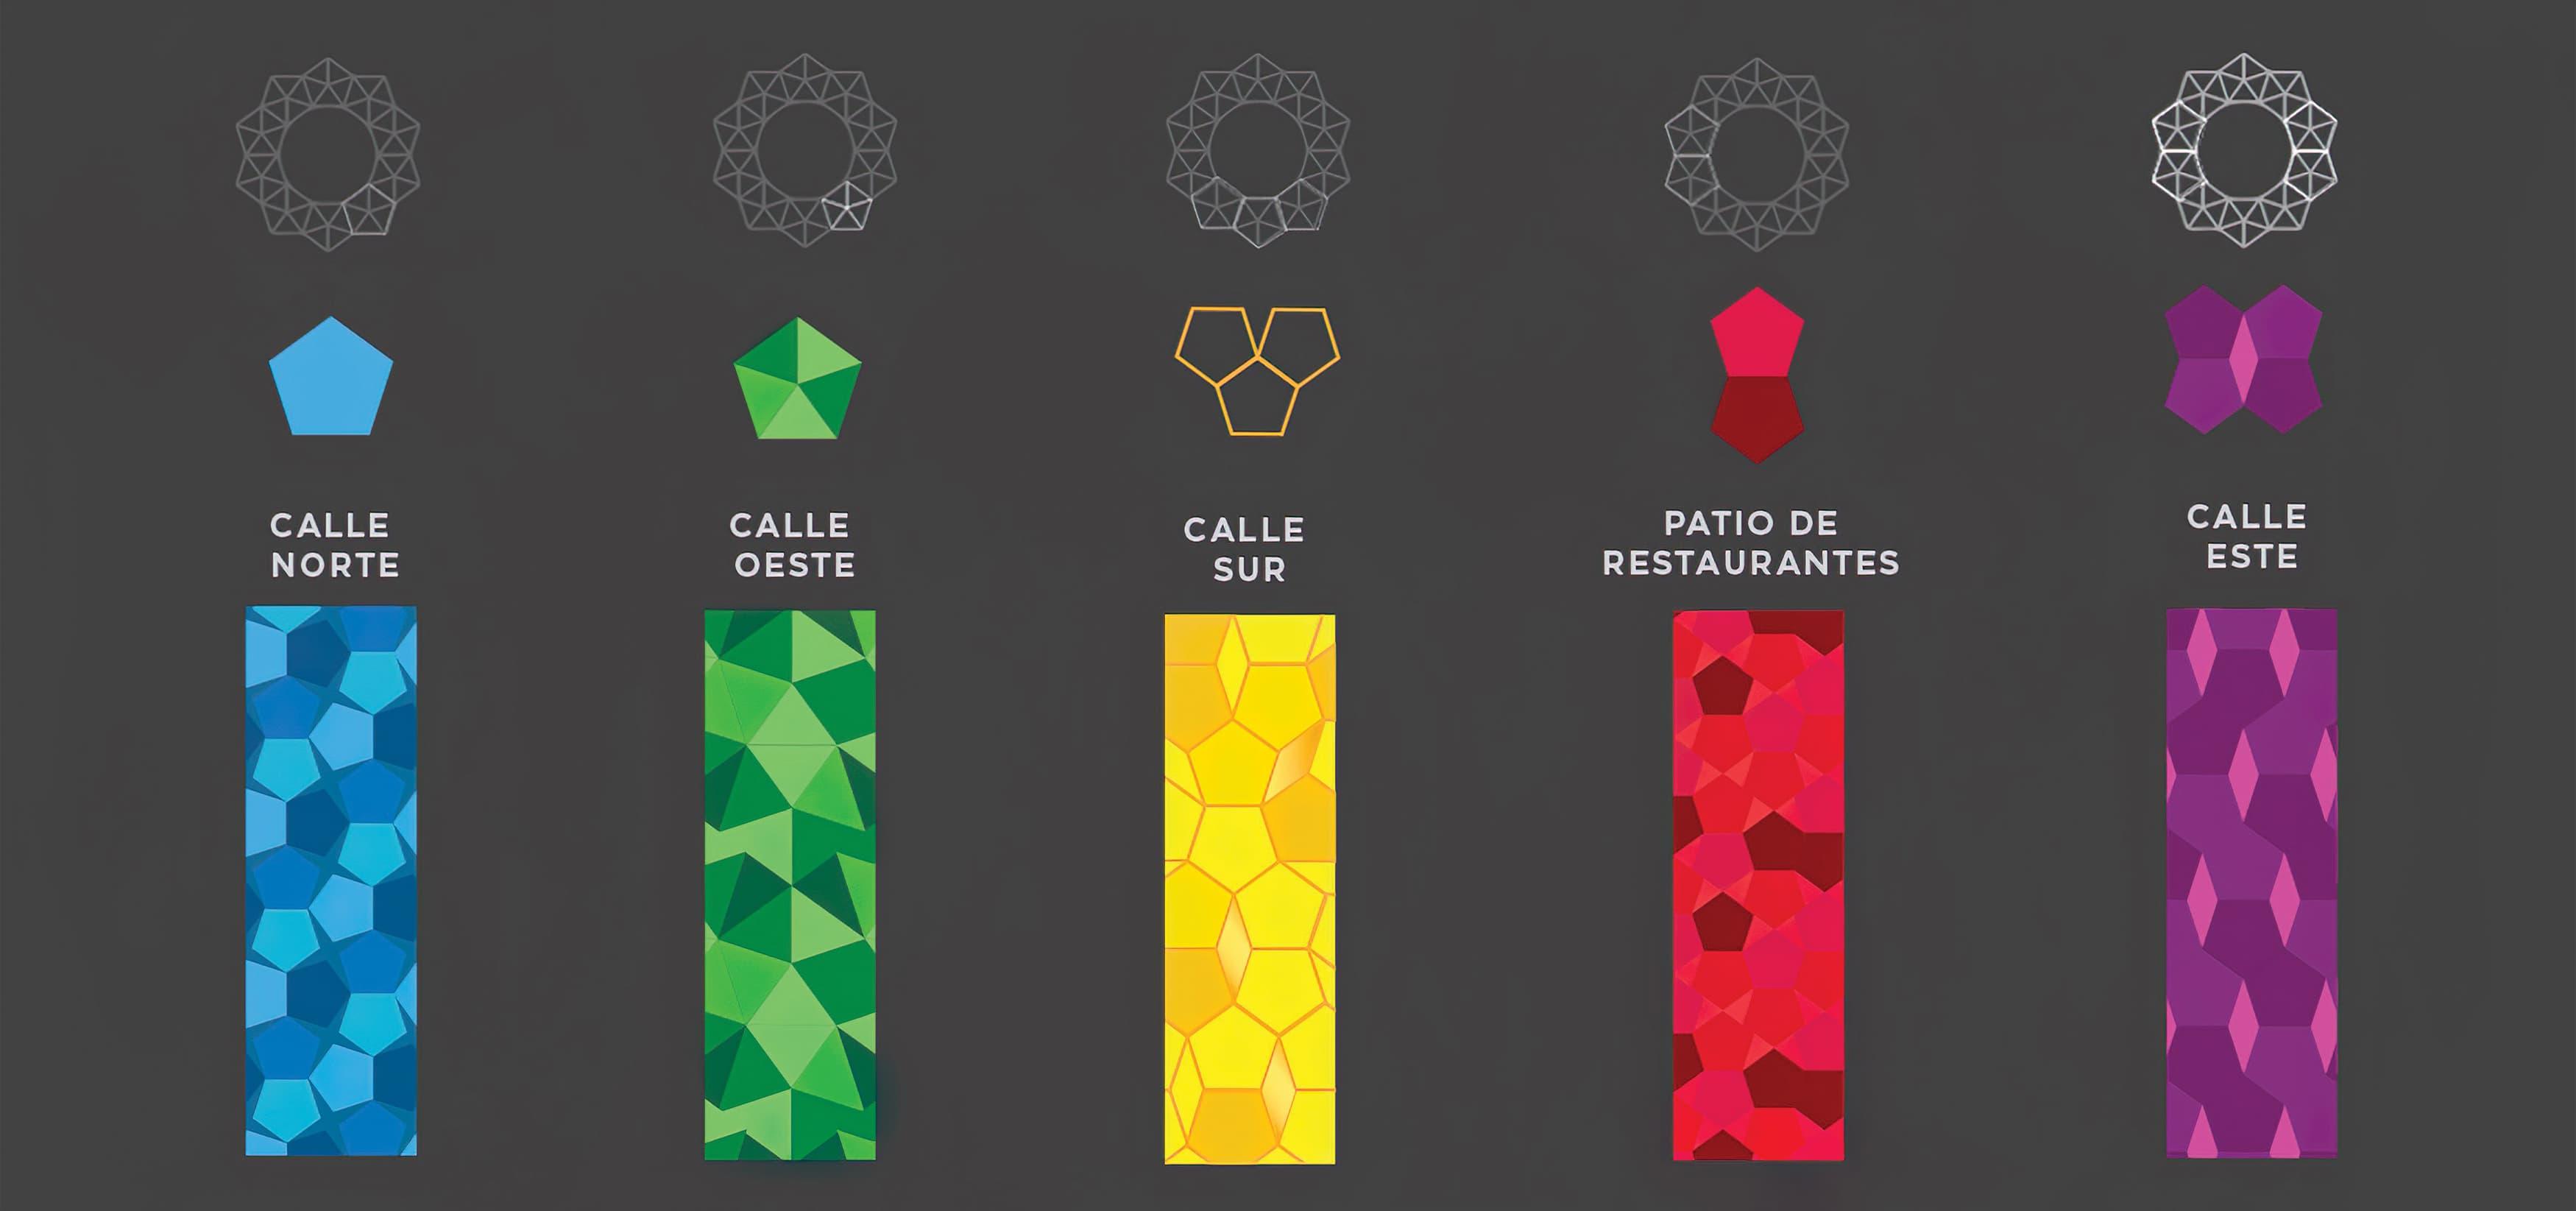 Forum Cuernavaca, a retail and mixed-use project in Cuernavaca, Mexico, district pattern design